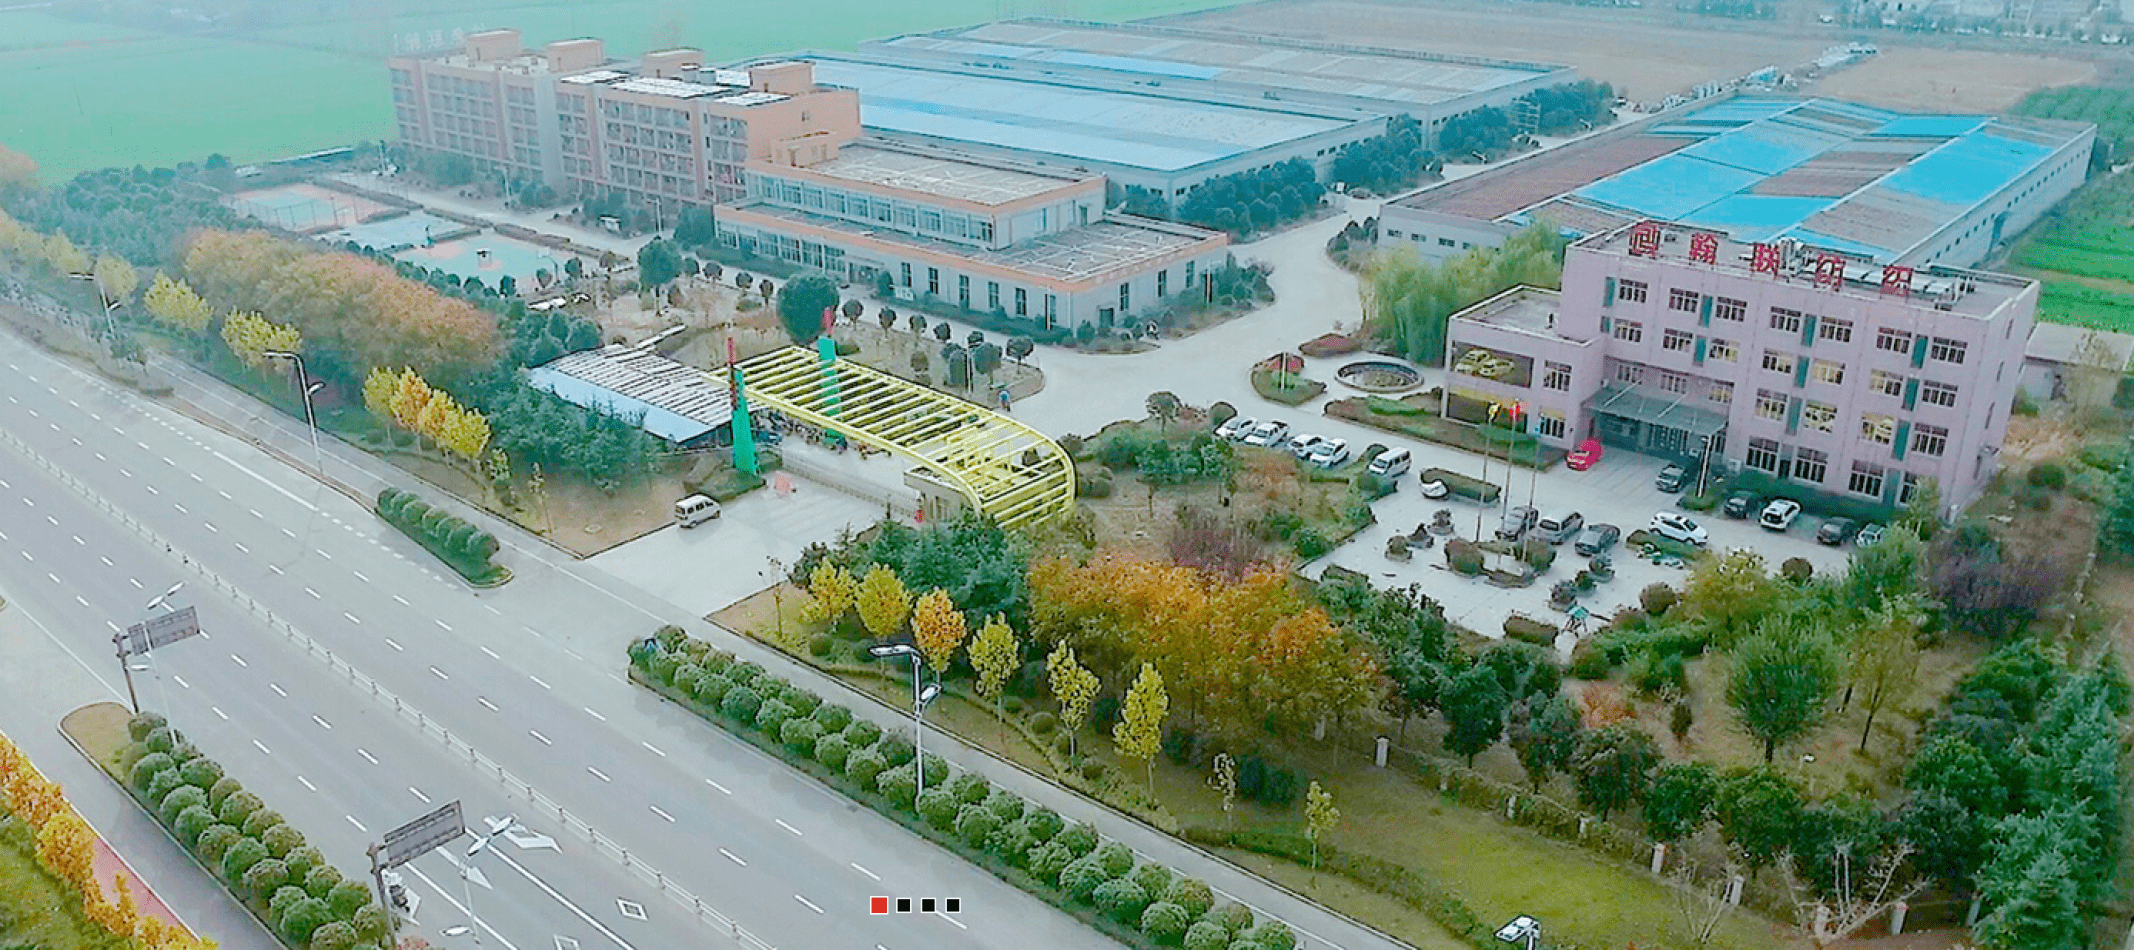 Anhui Hanlian Top Dyed Melange Yarn Co., Ltd.